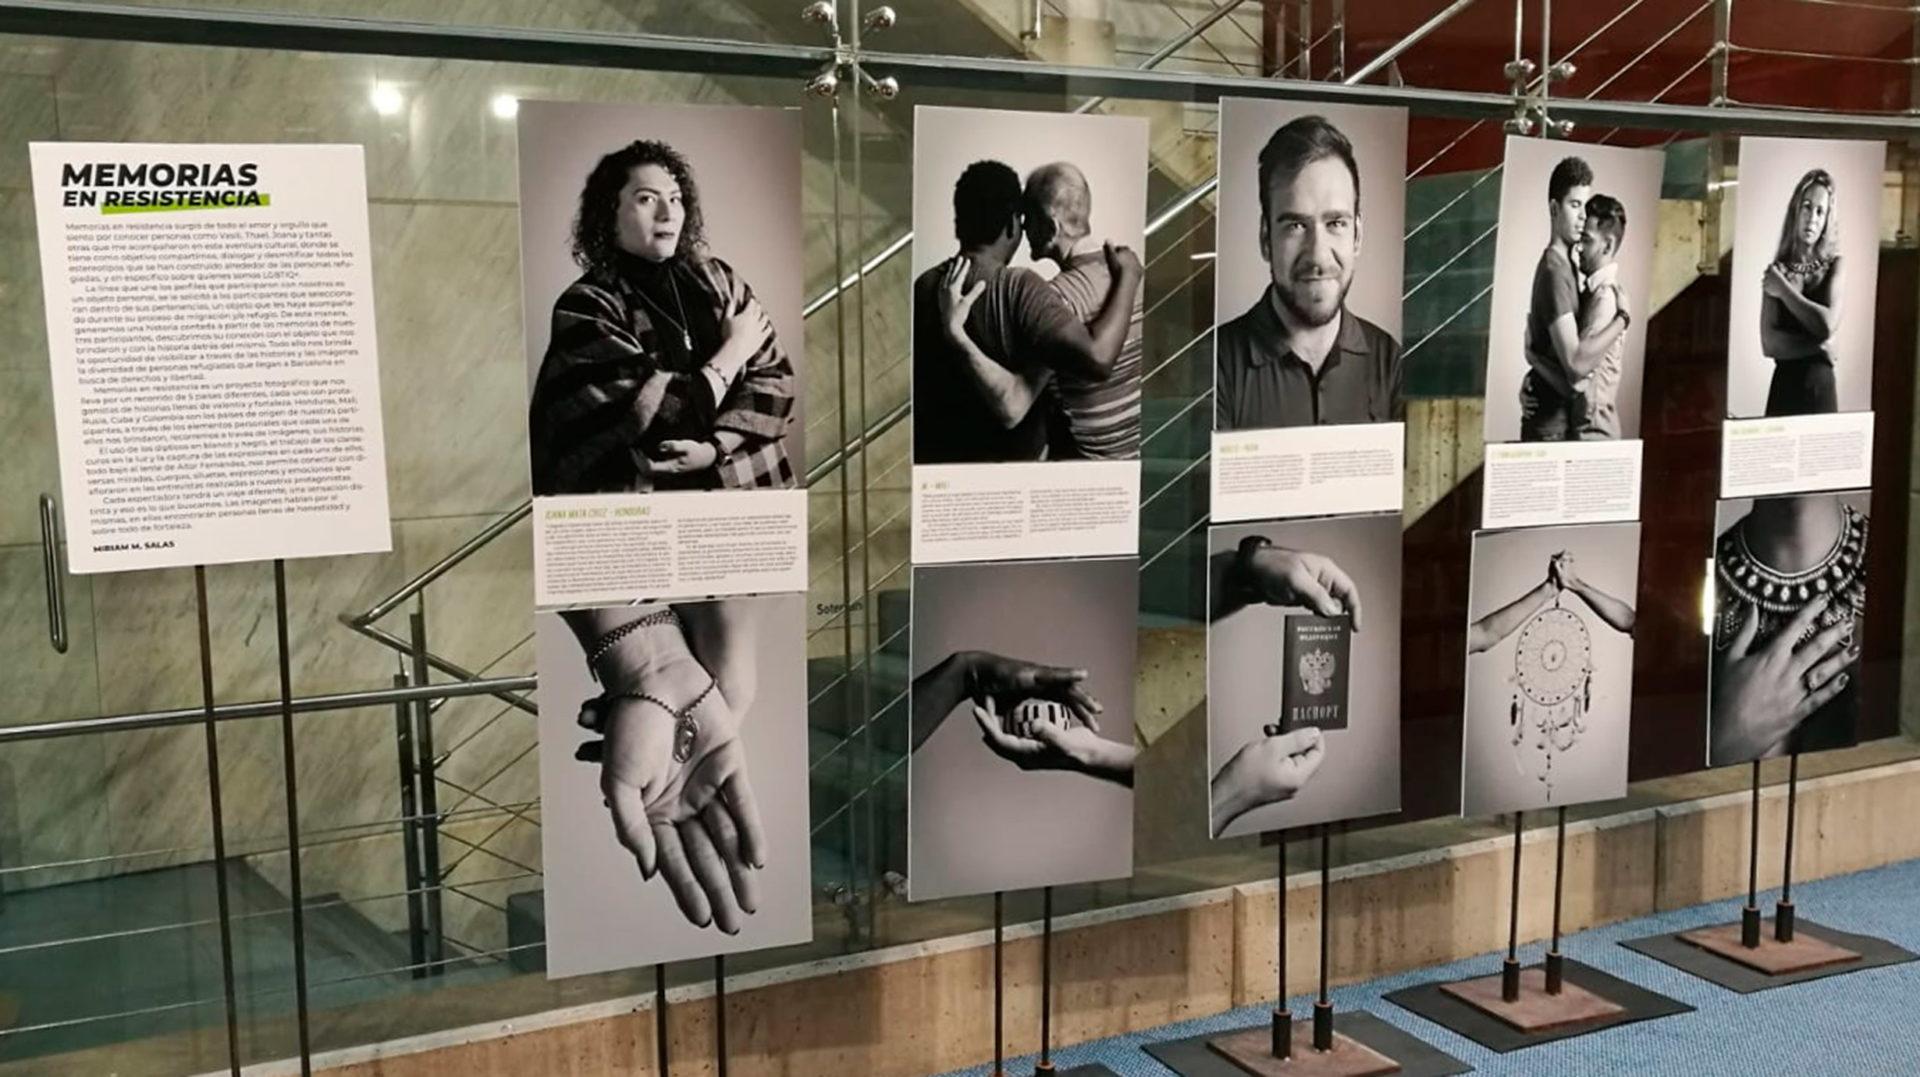 Taula rodona 'Memorias en resistencia'